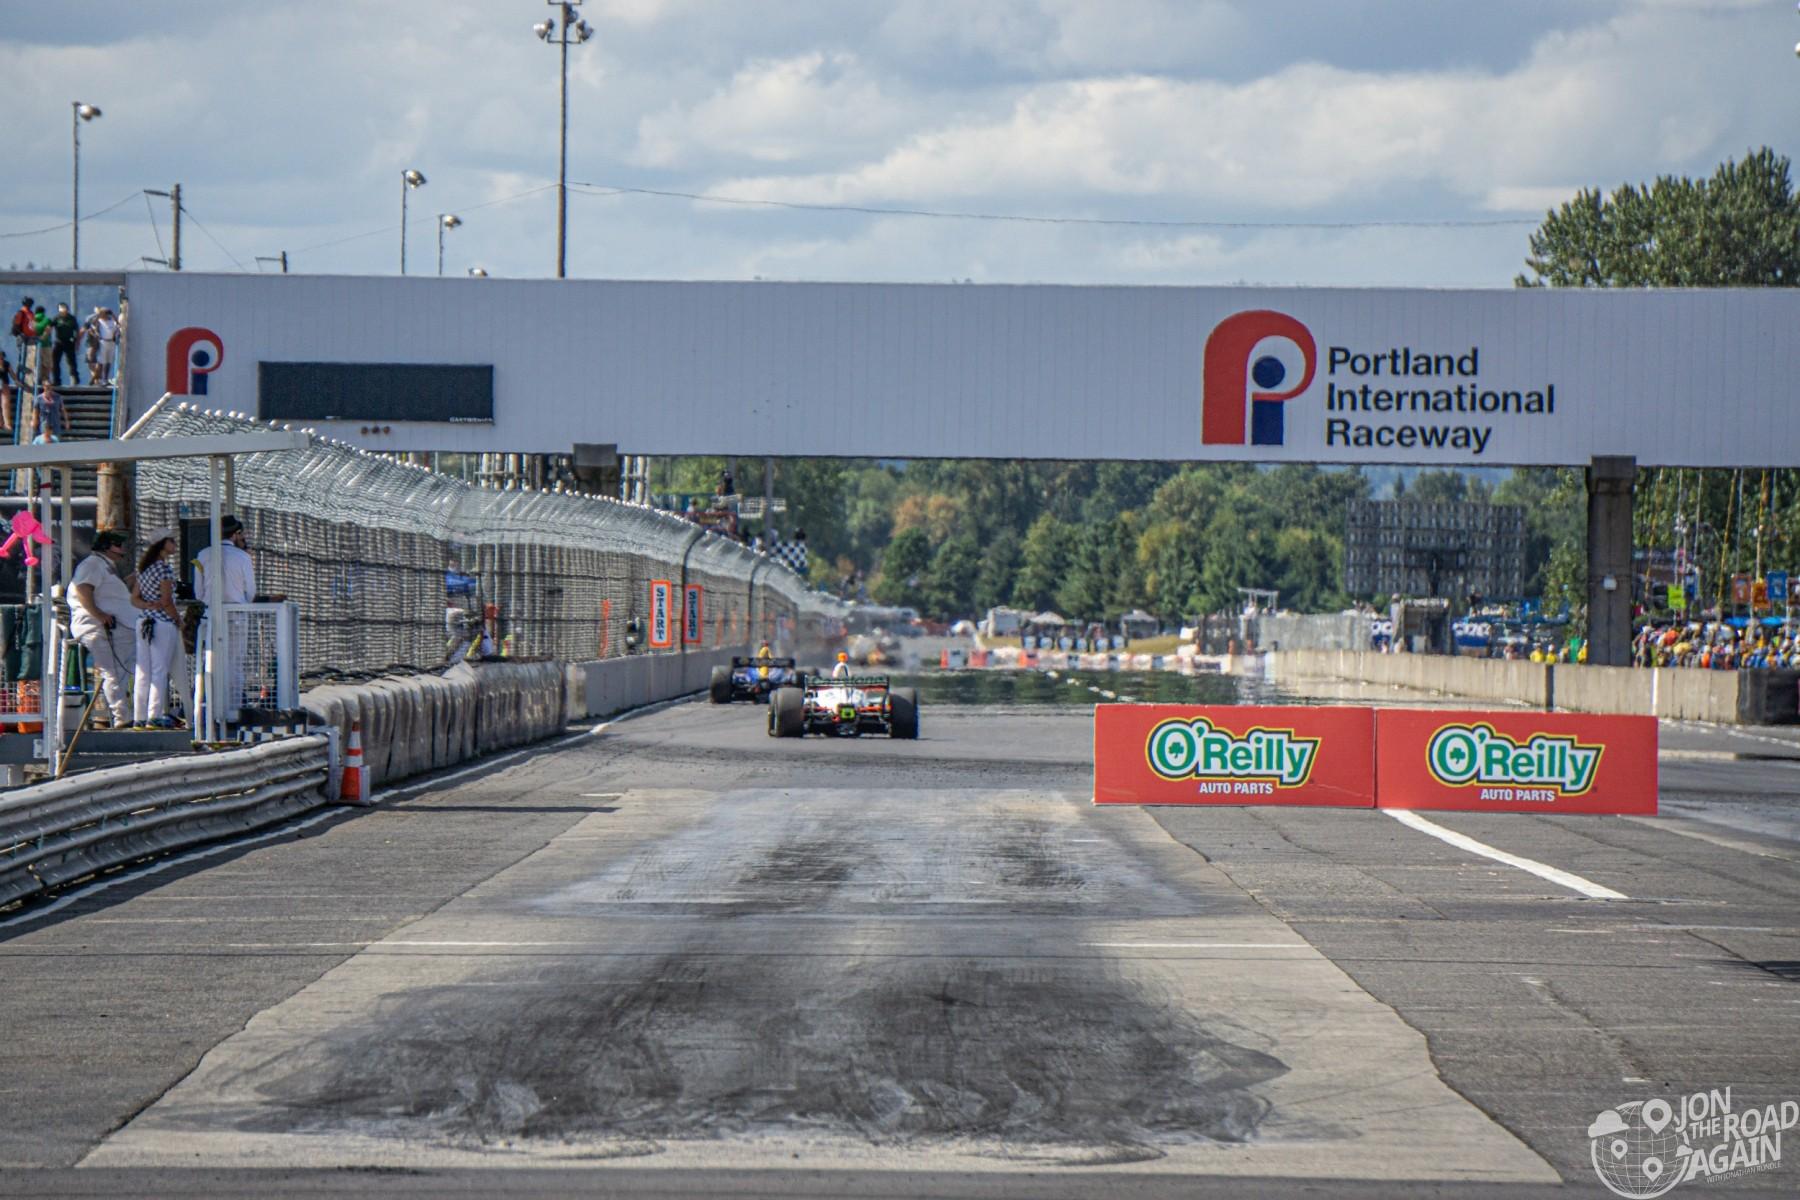 Portland International Raceway Grand Prix of Portland